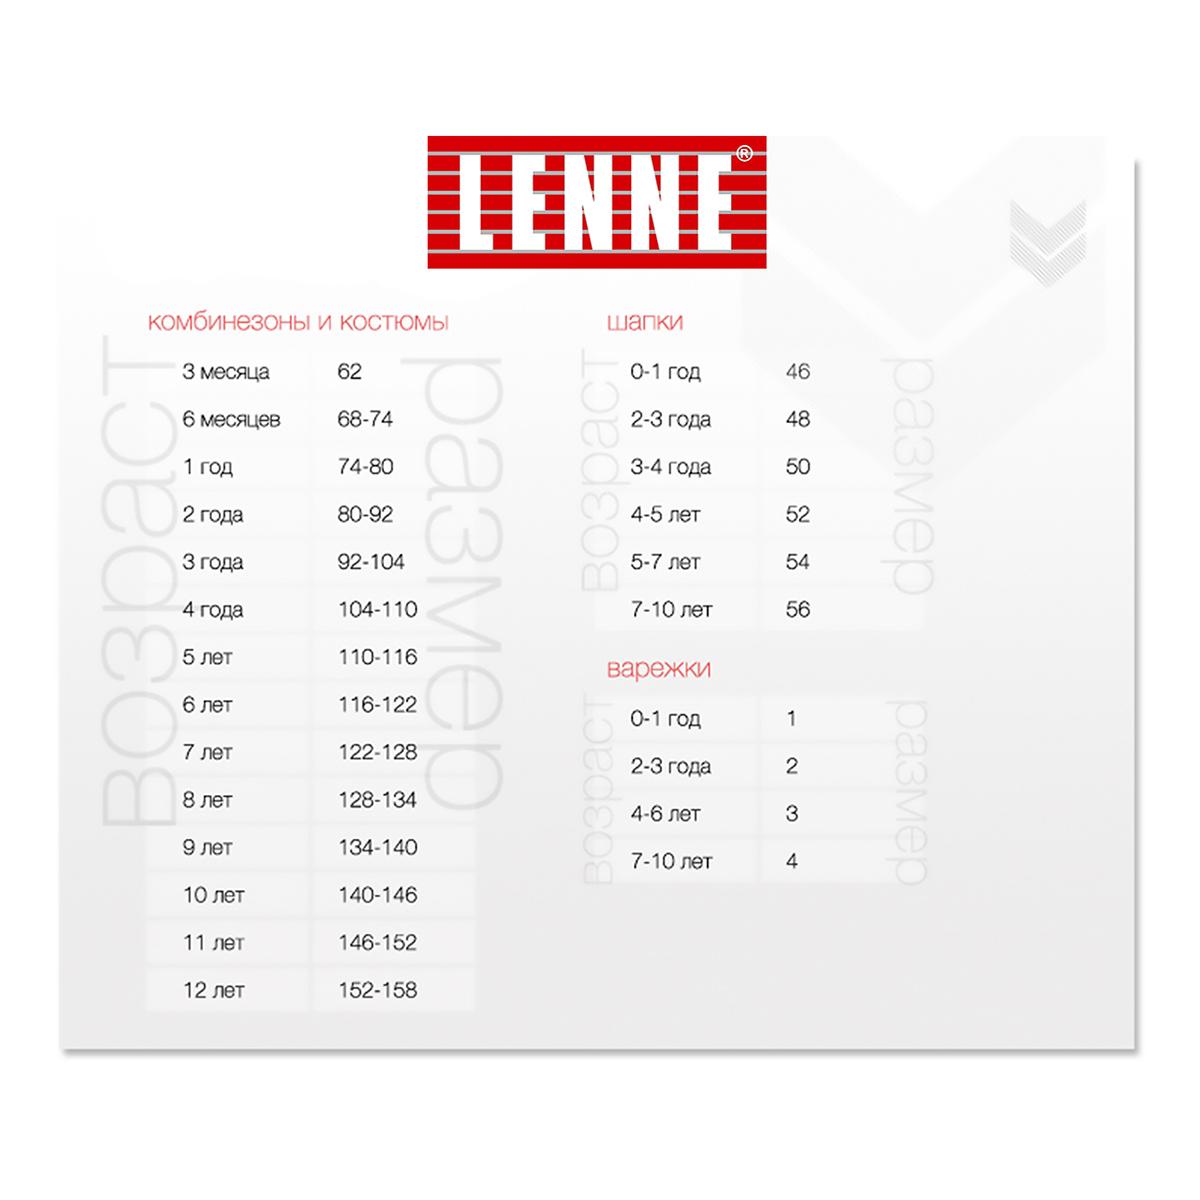 Купить Верхняя одежда, Парка LENNE Moss Red, р. 128 20339/622 ТМ: LENNE, красный